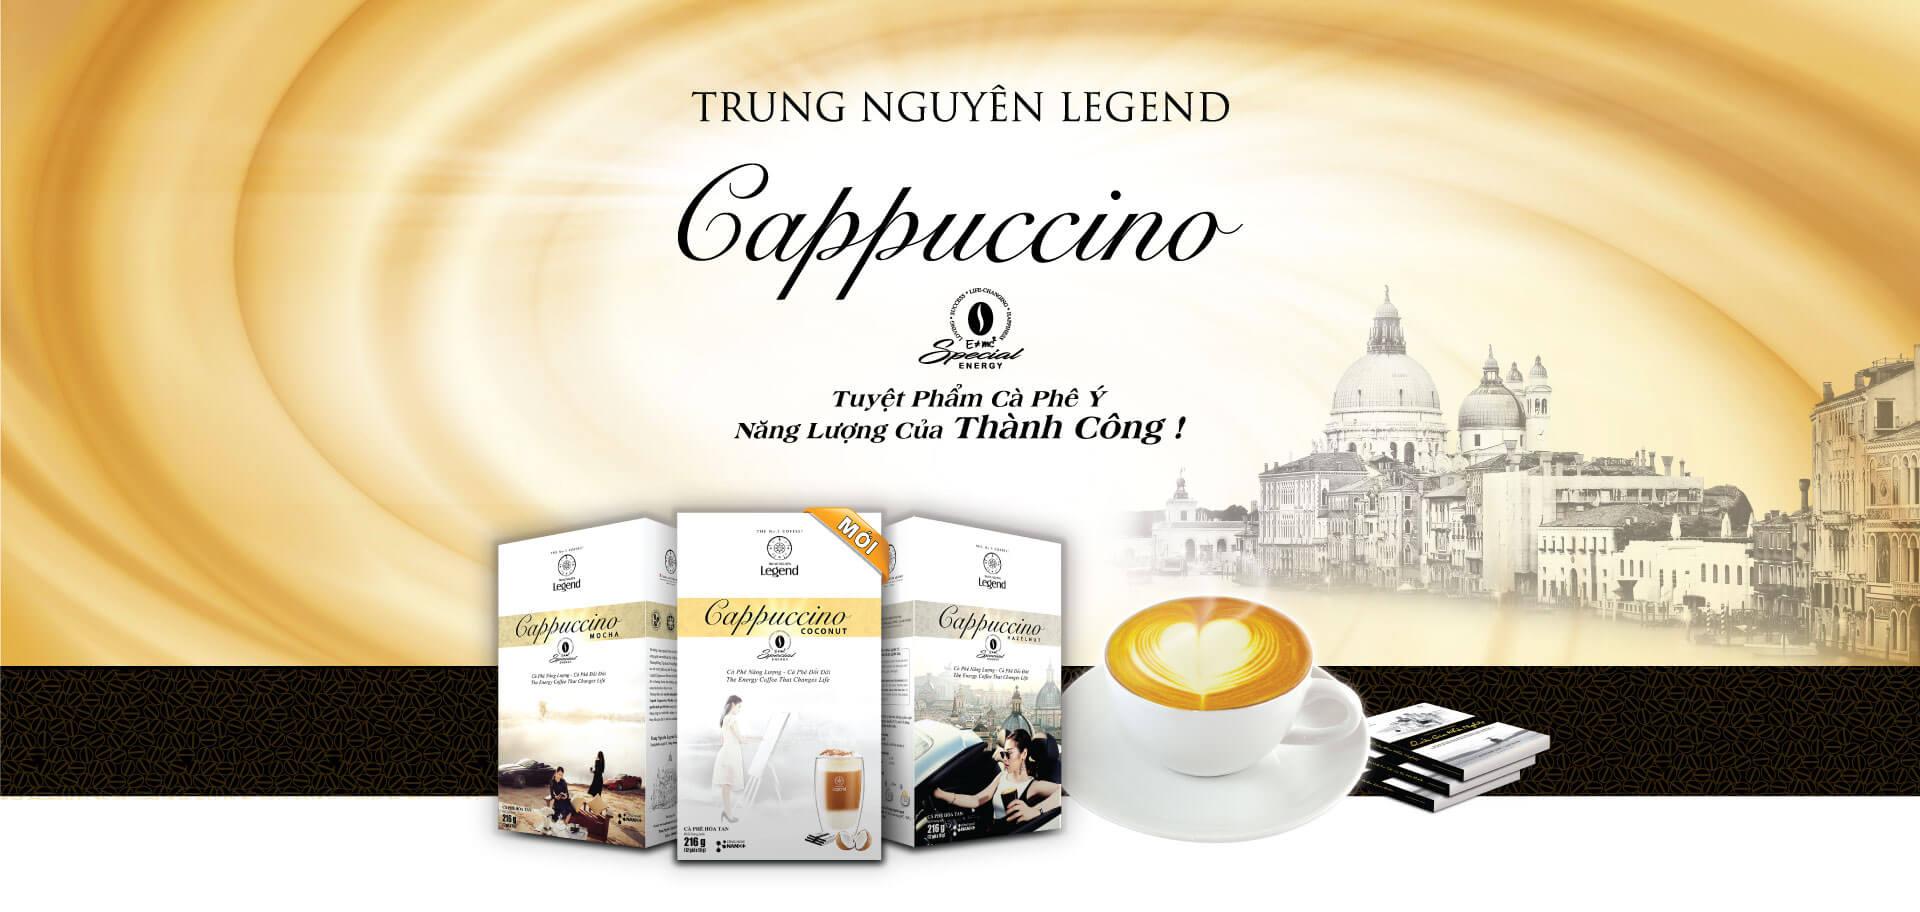 Trung Nguyên Legend Cappuccino